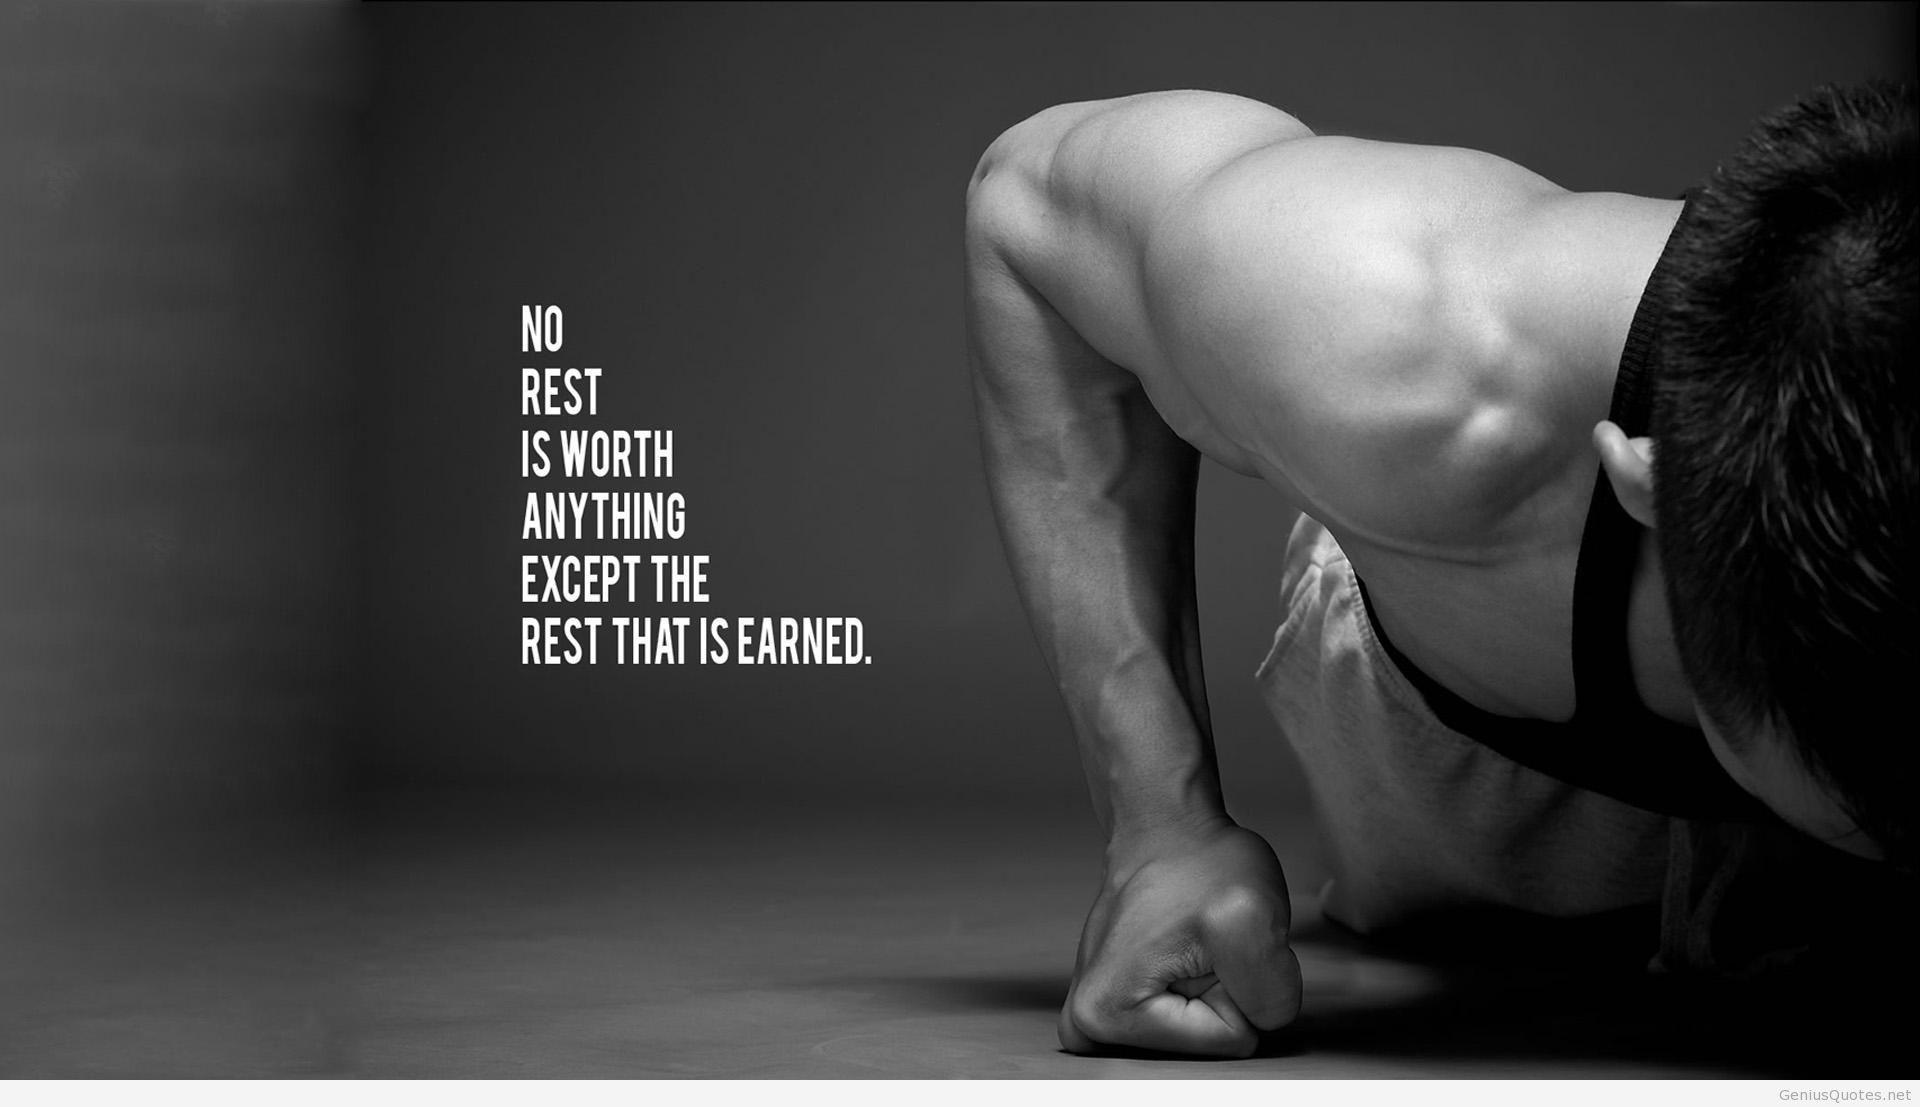 Arnold Schwarzenegger Bodybuilding Bodybuilding Motivation